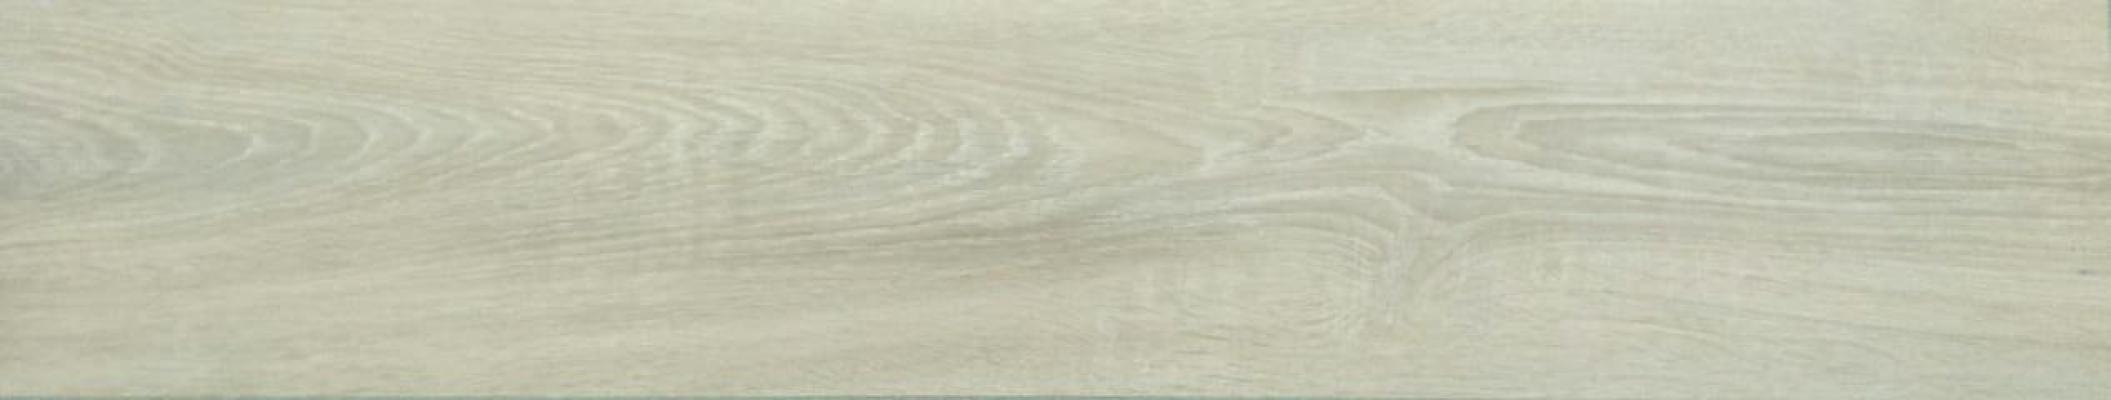 [NX 1805] mm Strip Vinyl SPC